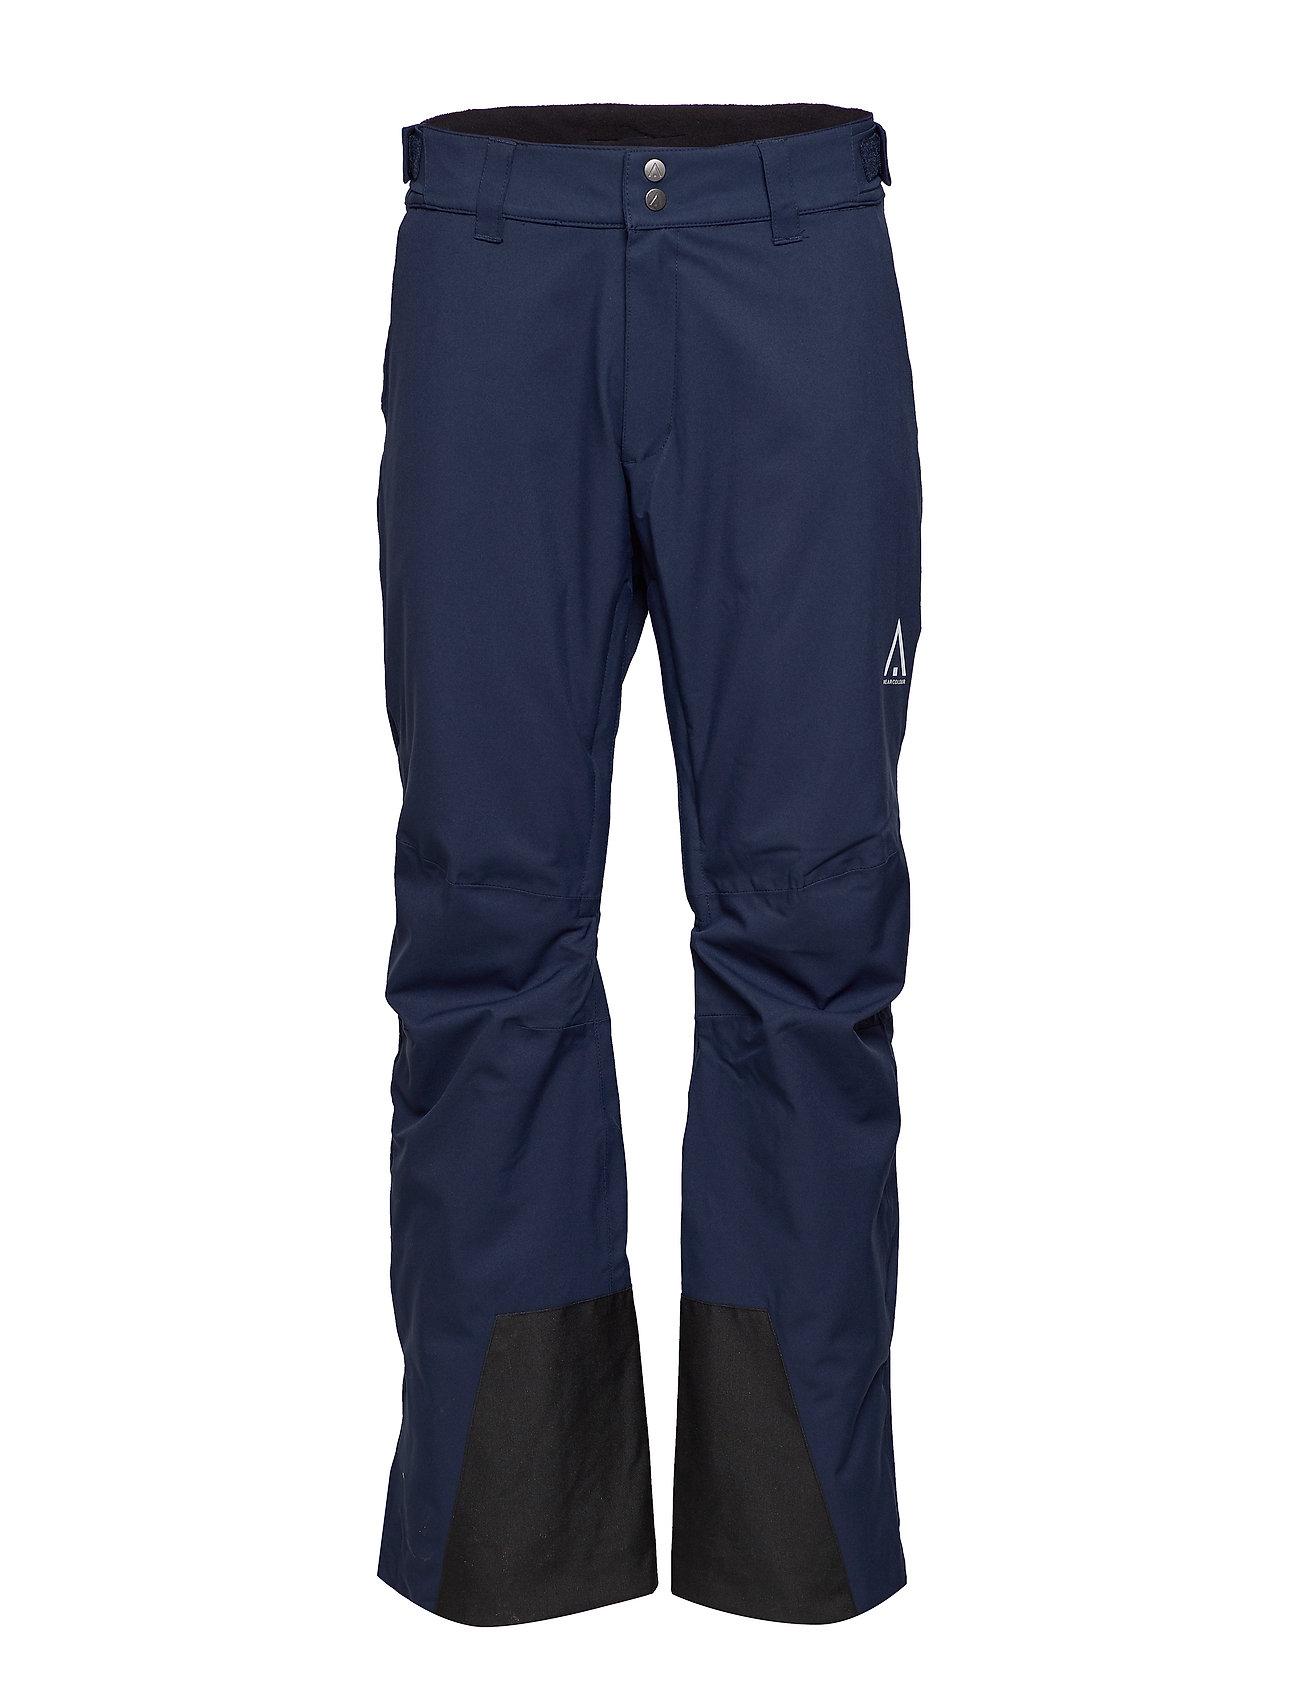 Image of Vert Pant Sport Pants Blå WearColour (3267707115)